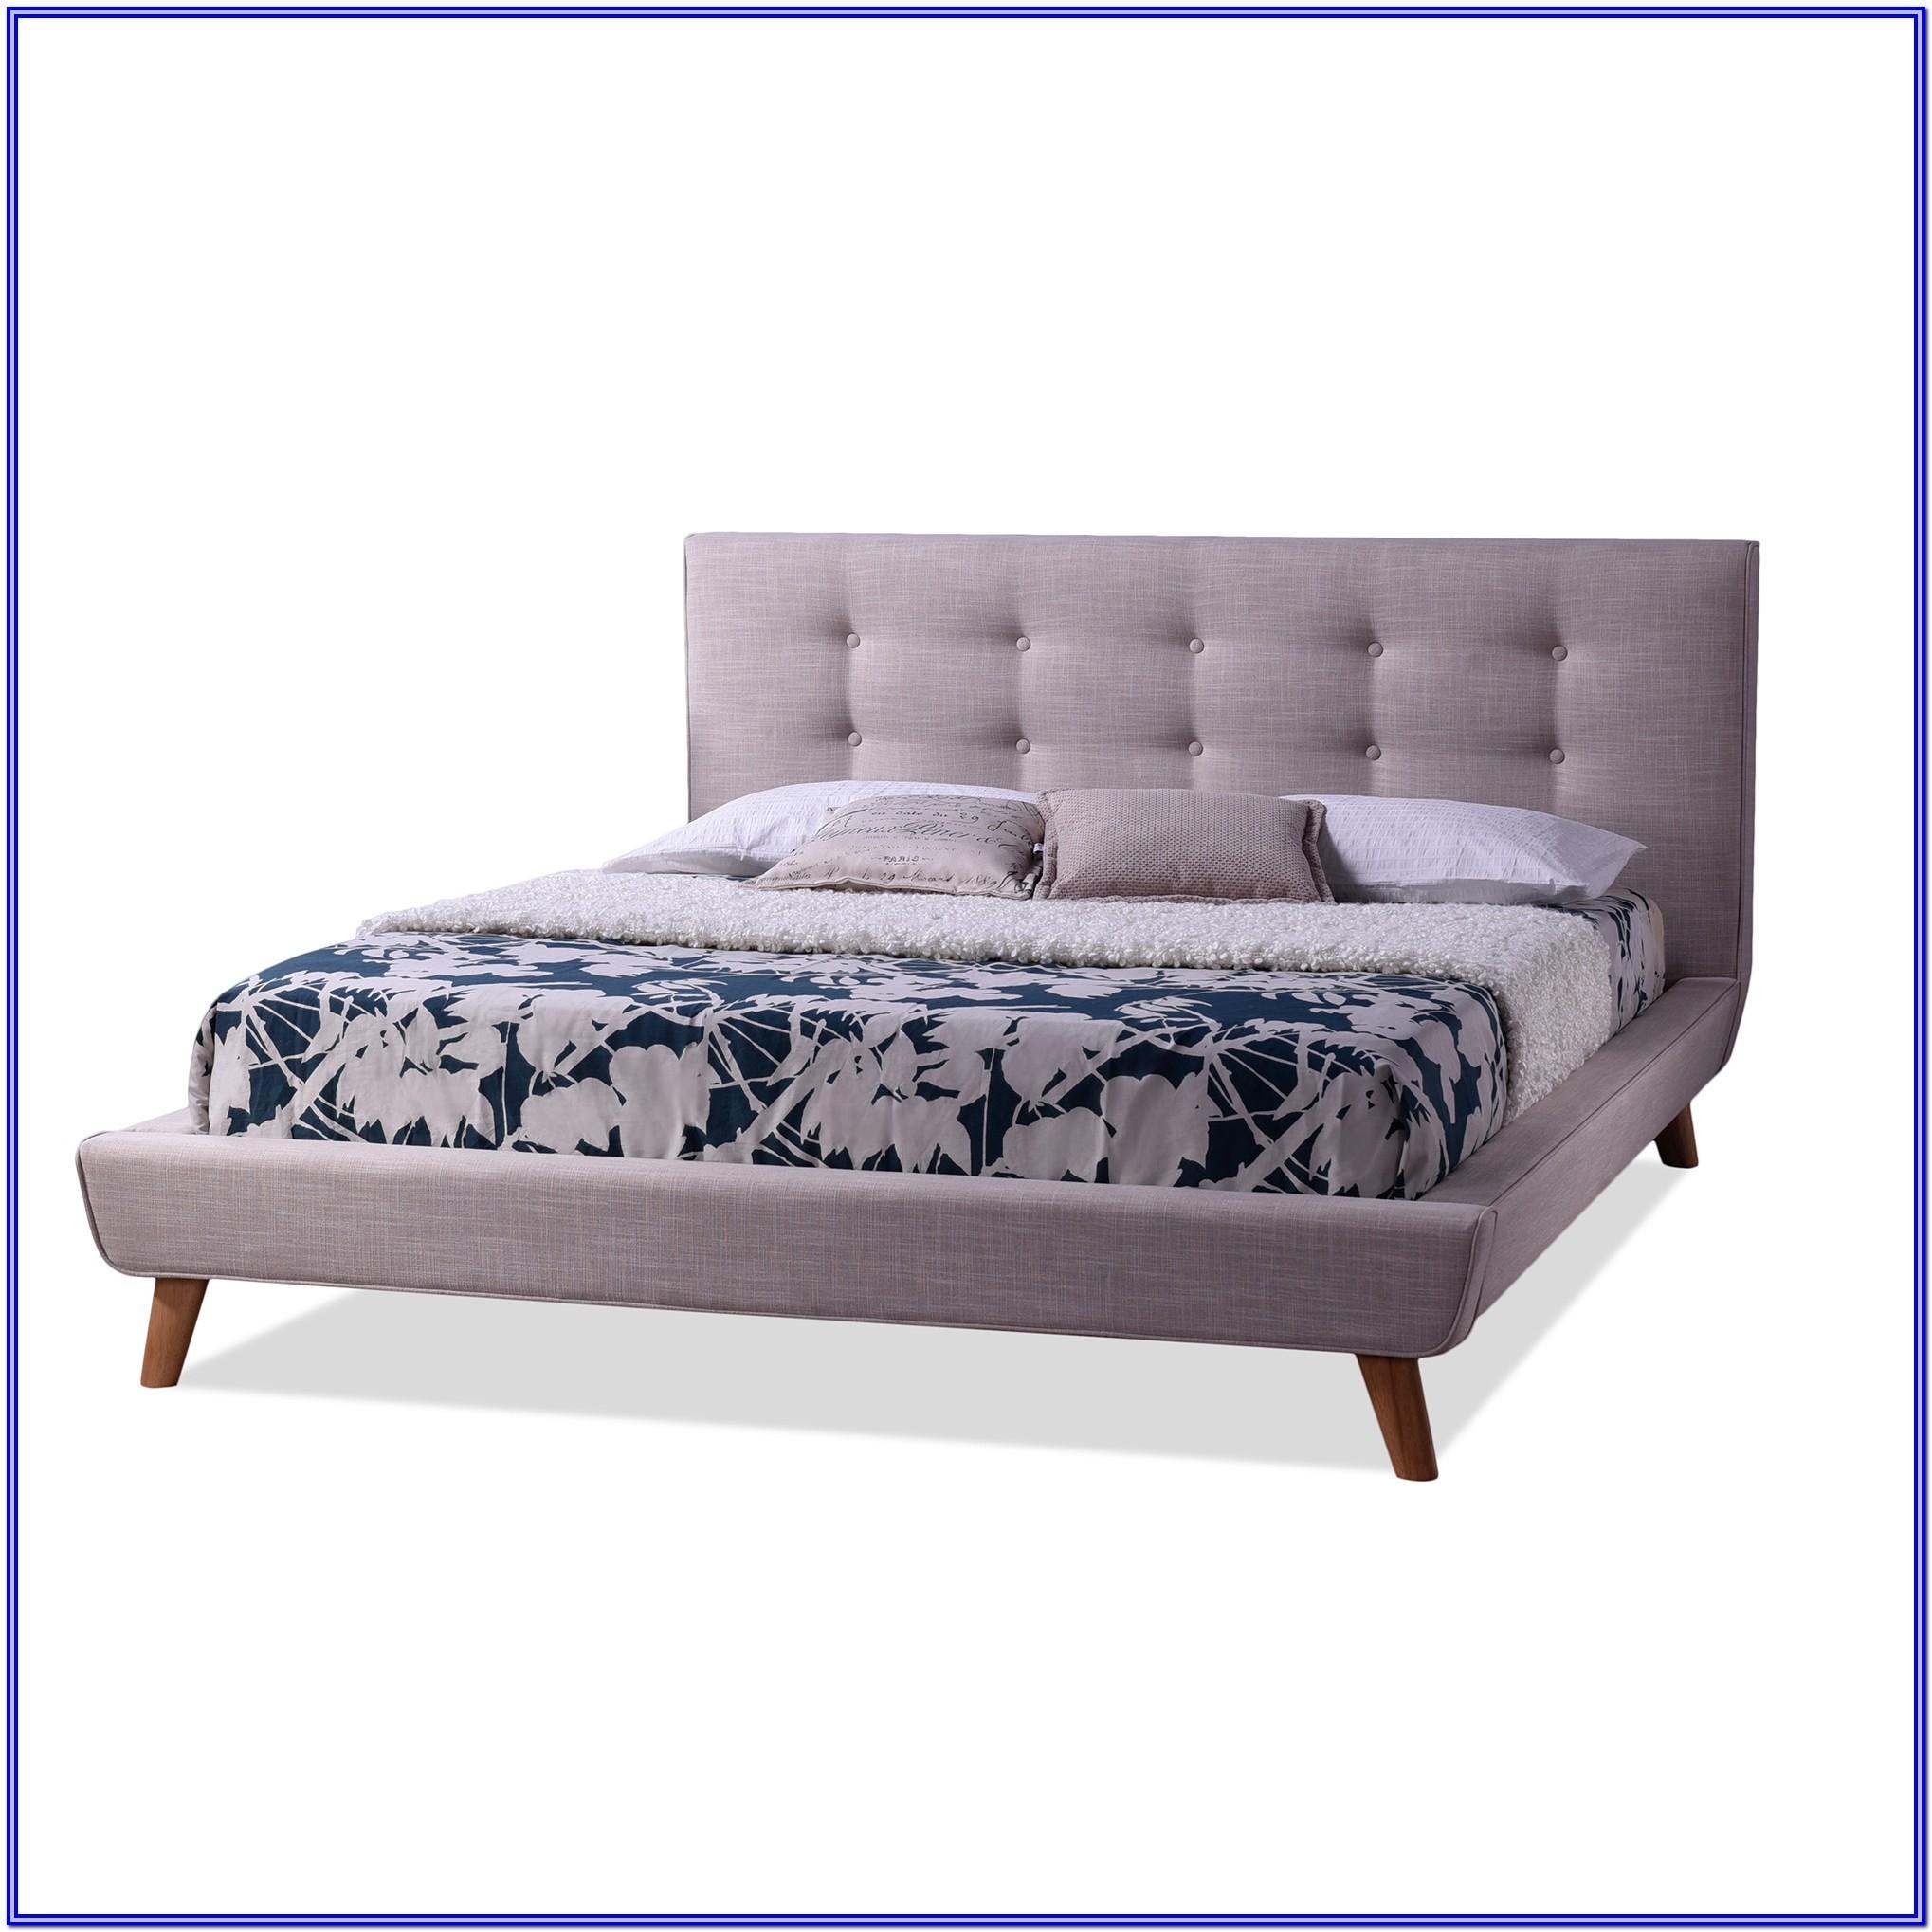 Baxton Studio King Jessie Upholstered Platform Bed In Grey